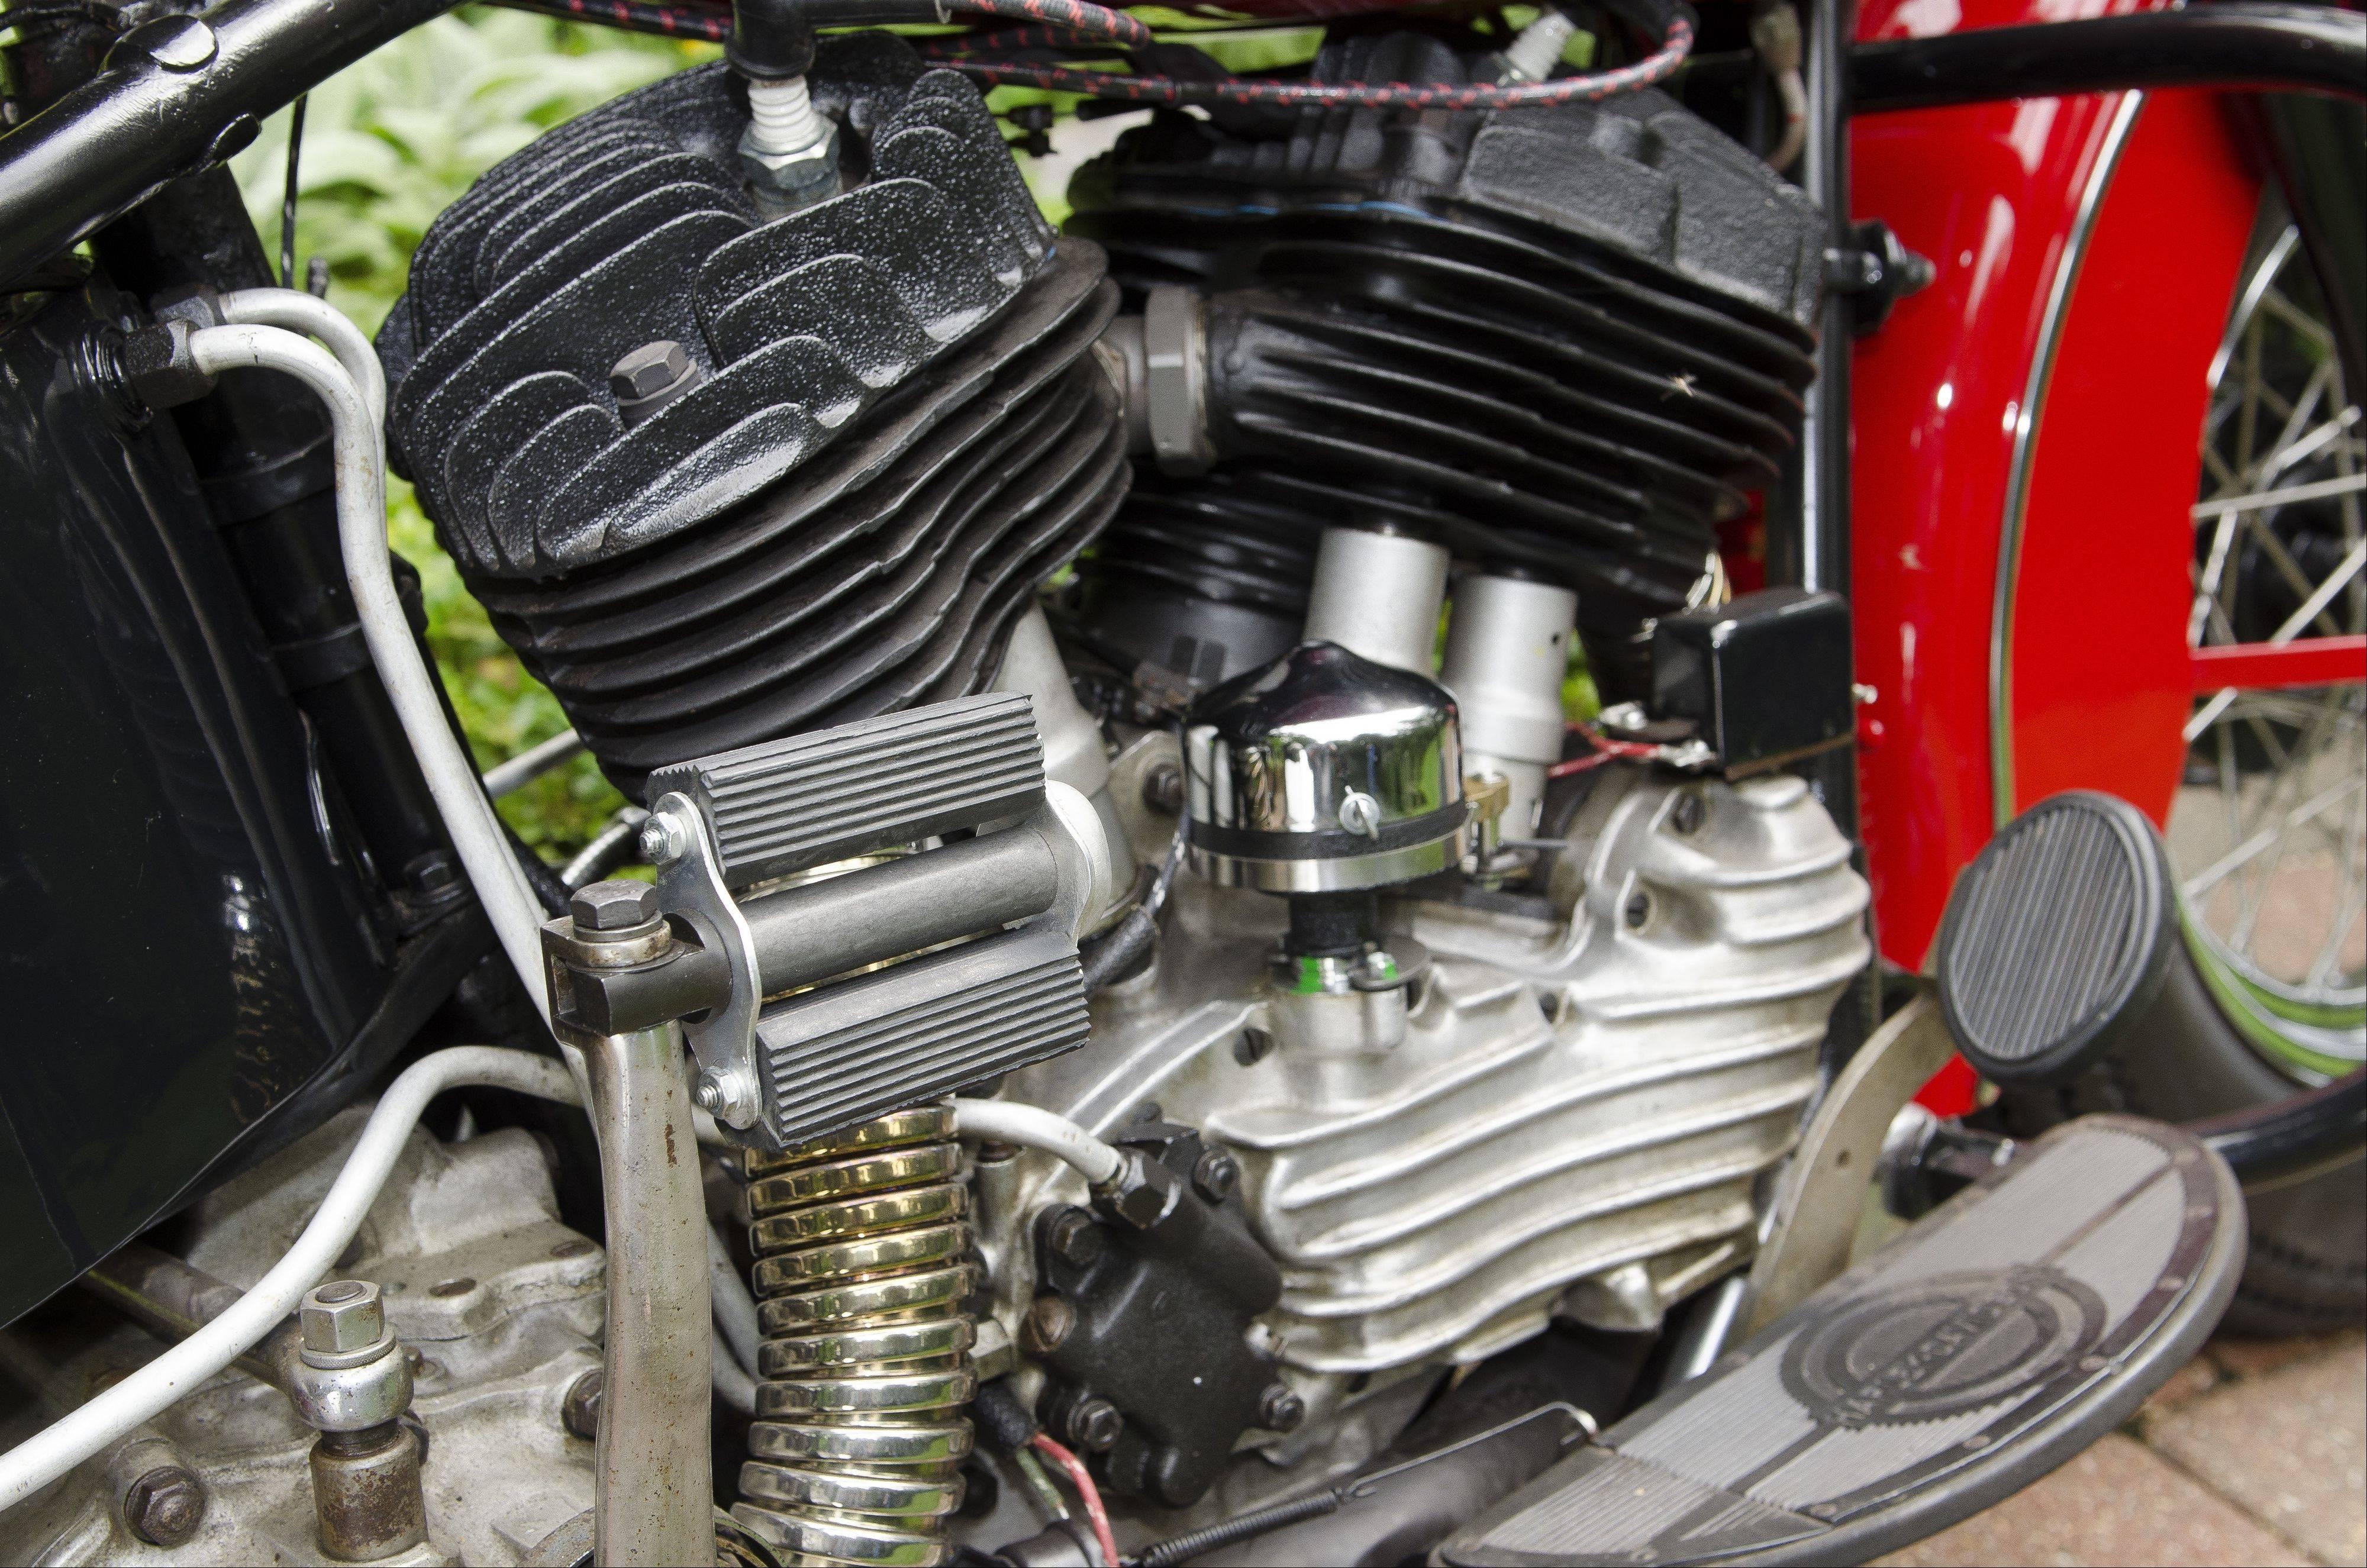 Classic recollections: 1940 Harley-Davidson UL flathead